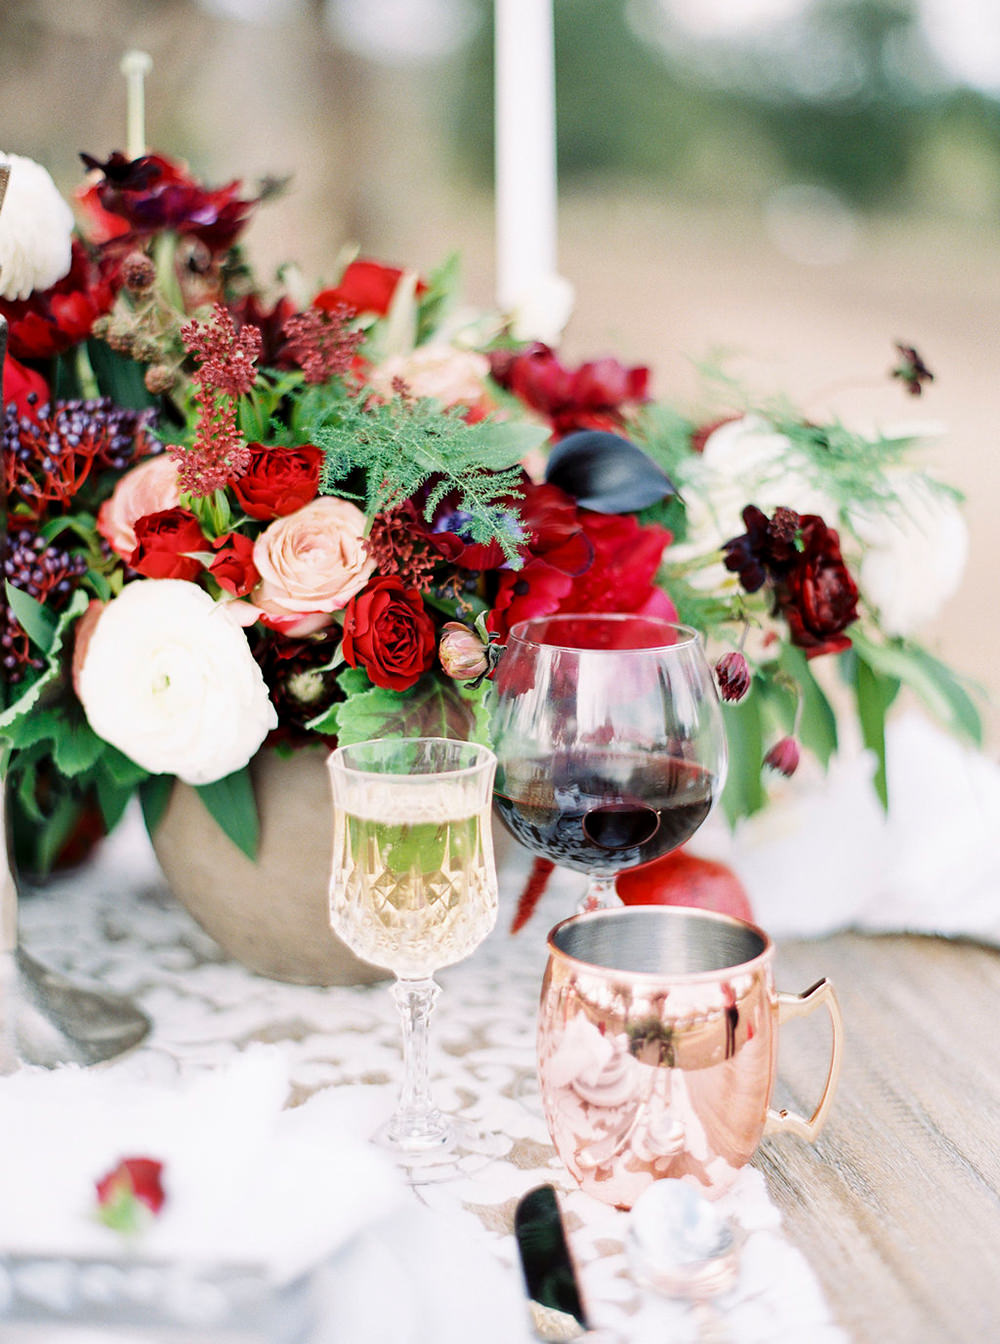 wedding tablescapes - photo by Amanda Lenhardt https://ruffledblog.com/relaxed-san-juan-capistrano-wedding-inspiration